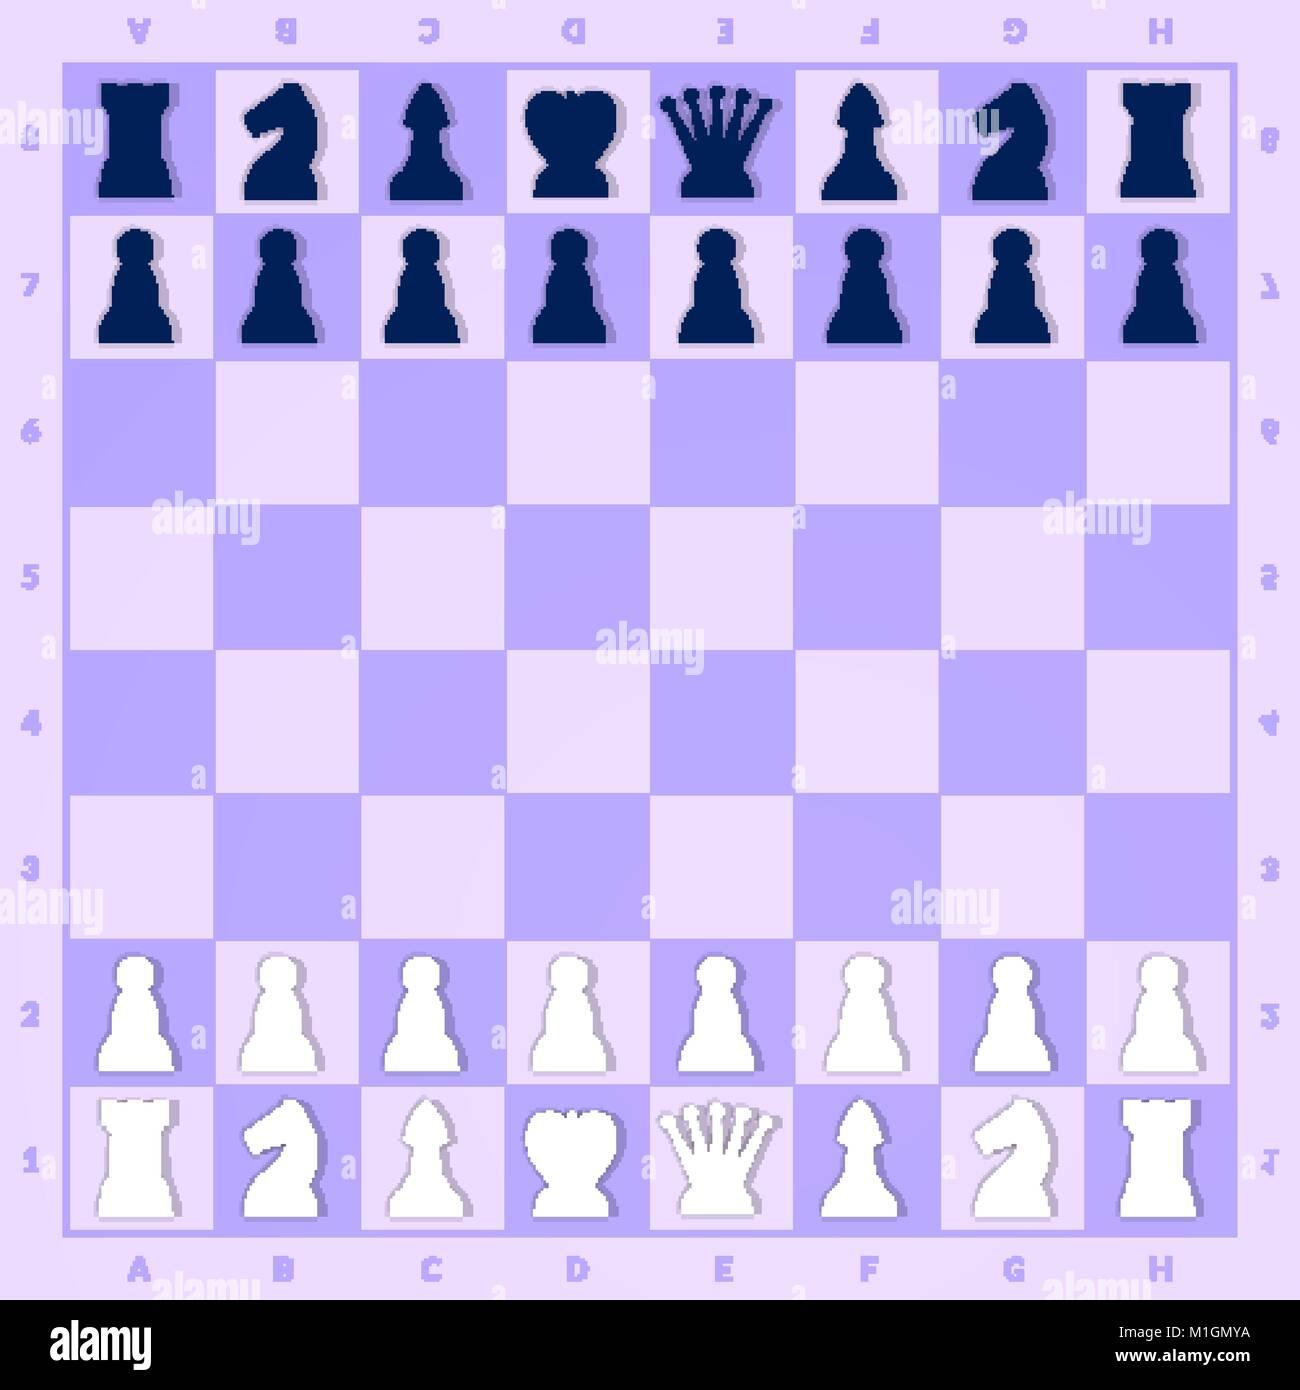 Chess Game Start Setup Chessboard Pattern Background Stock Vector